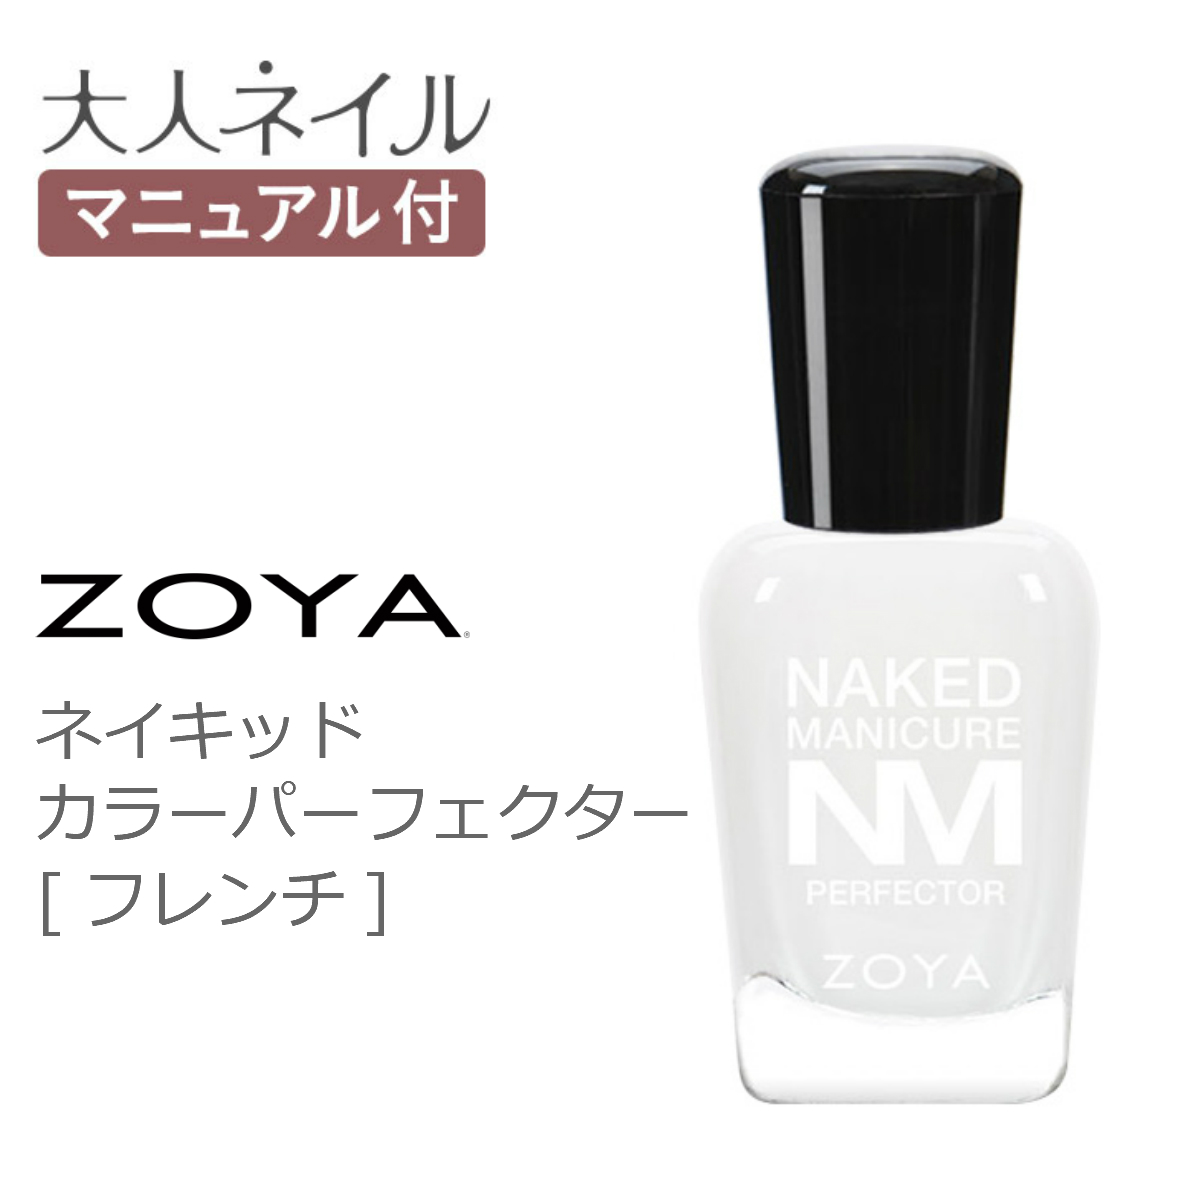 ZOYA ゾーヤ ネイキッドマニキュア カラーパーフェクター ZP789 TIP 15ml フレンチ フリーエッジ